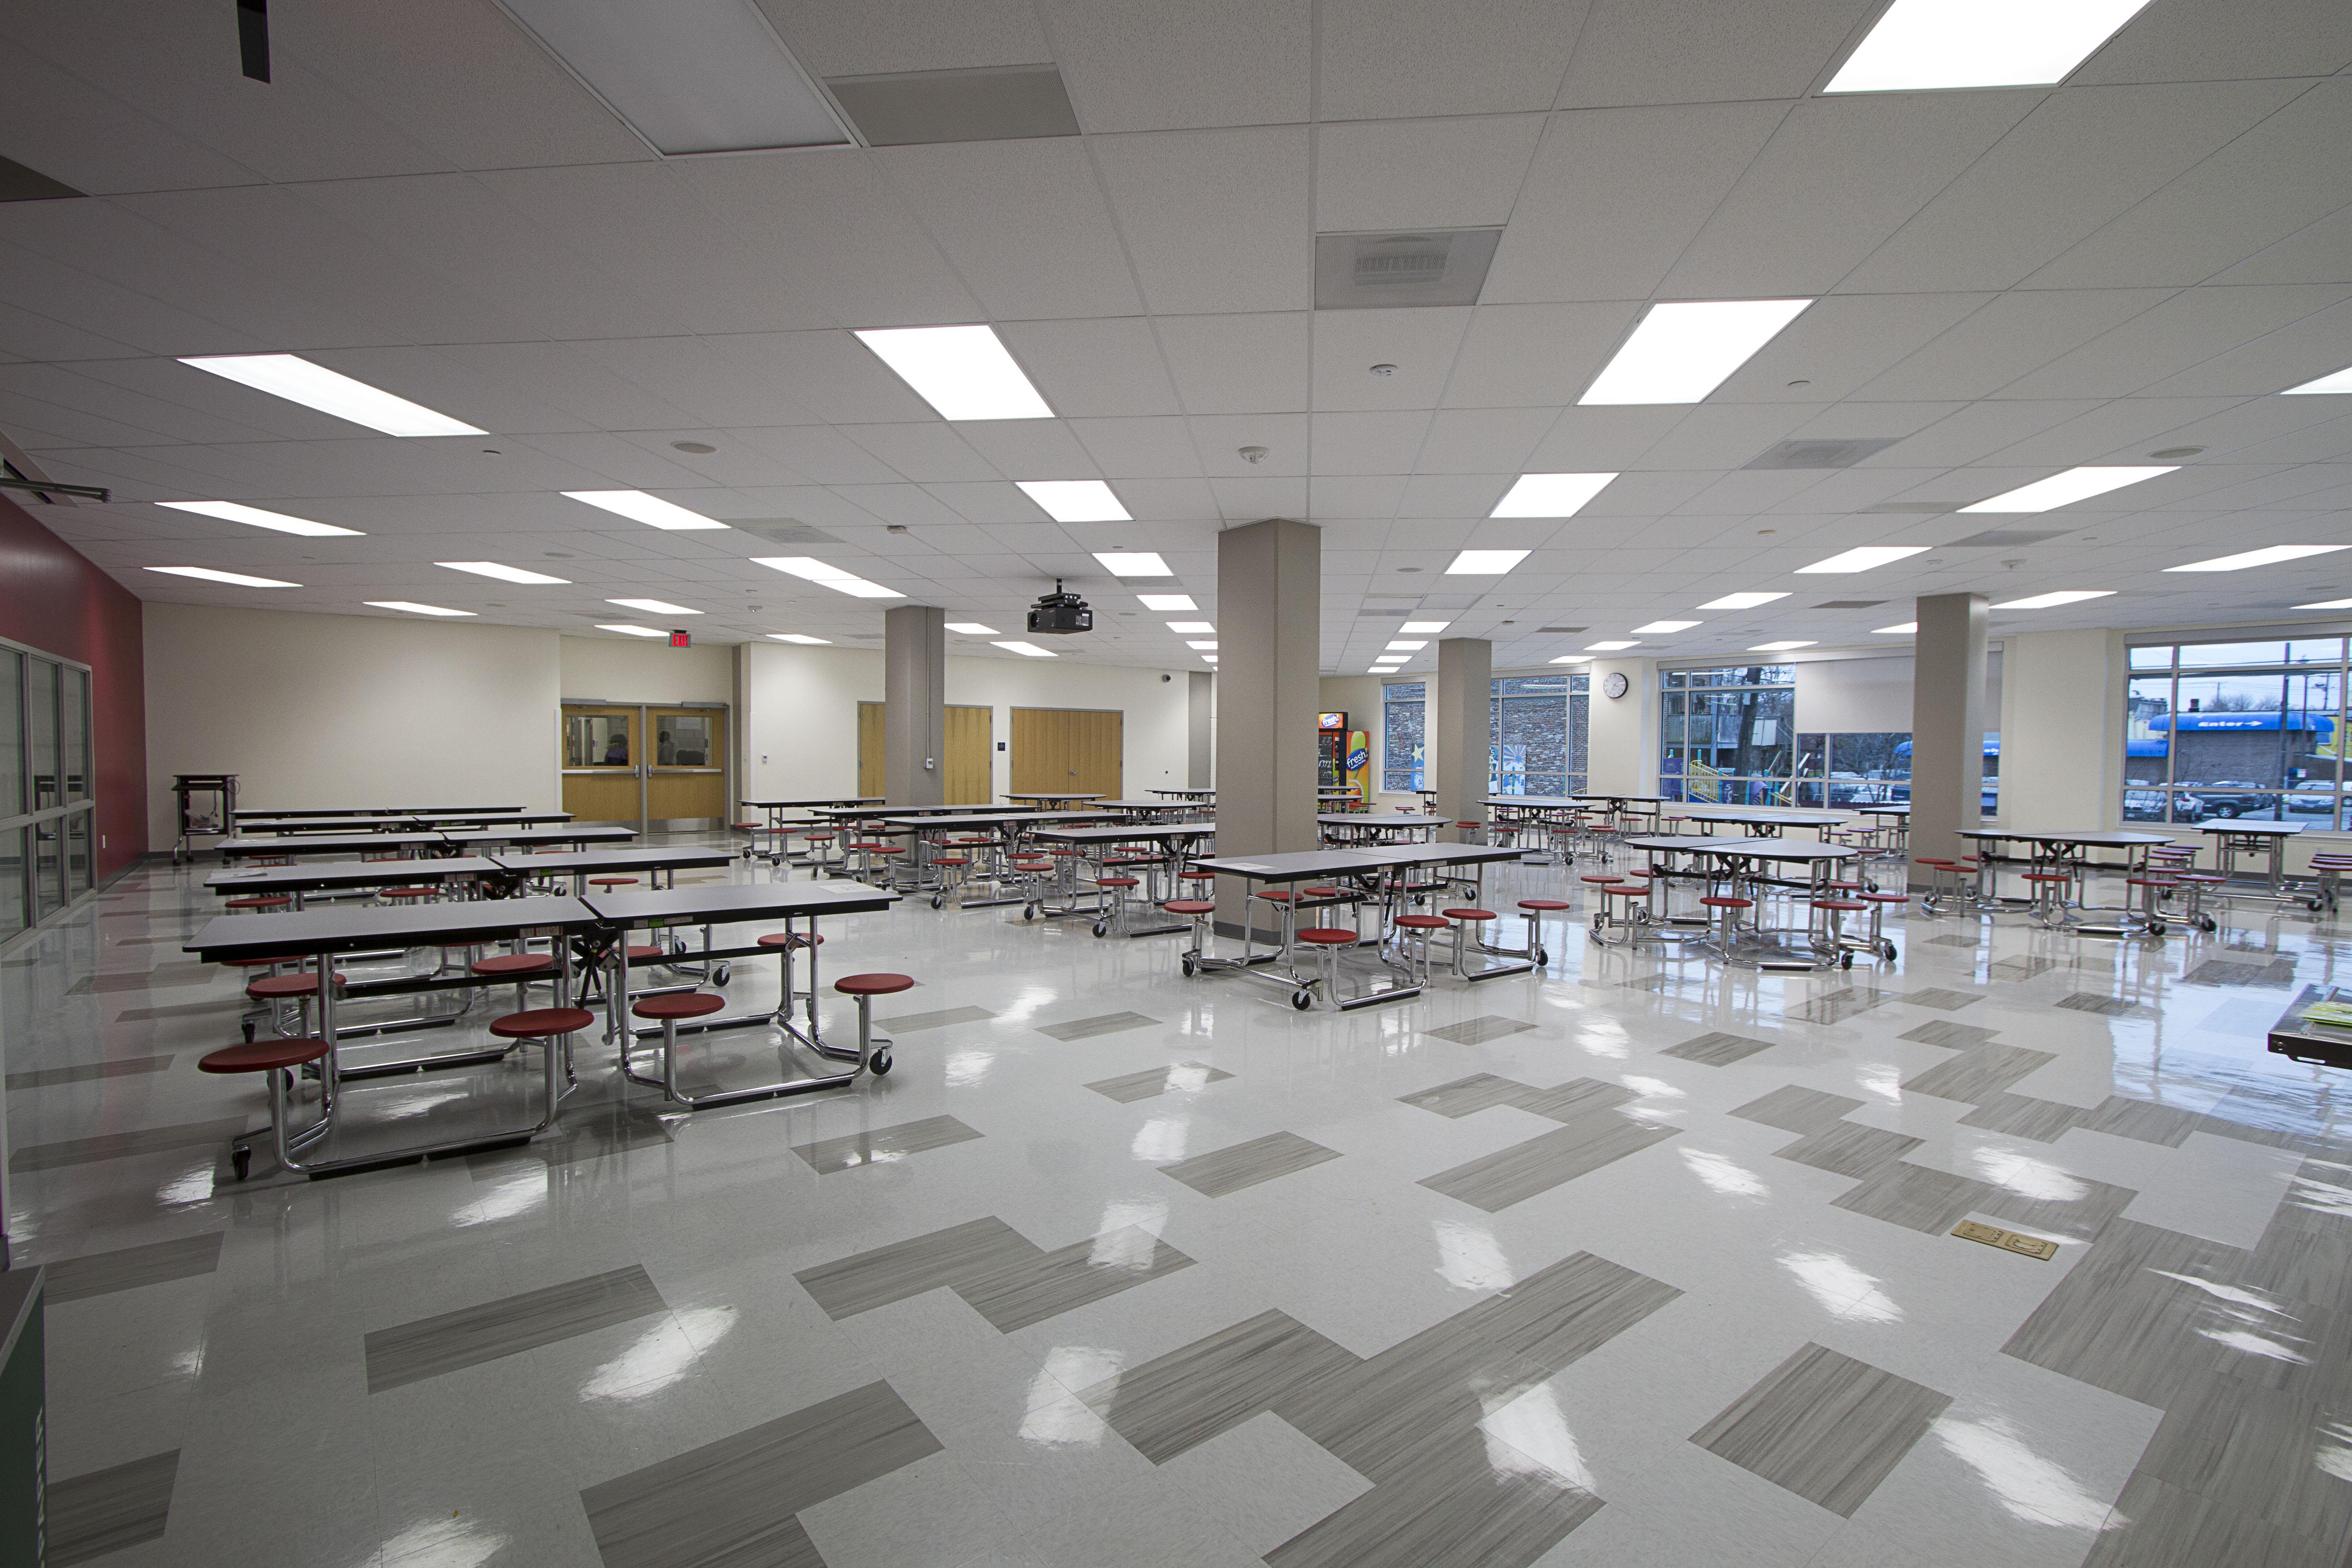 Technology Preparatory Academy